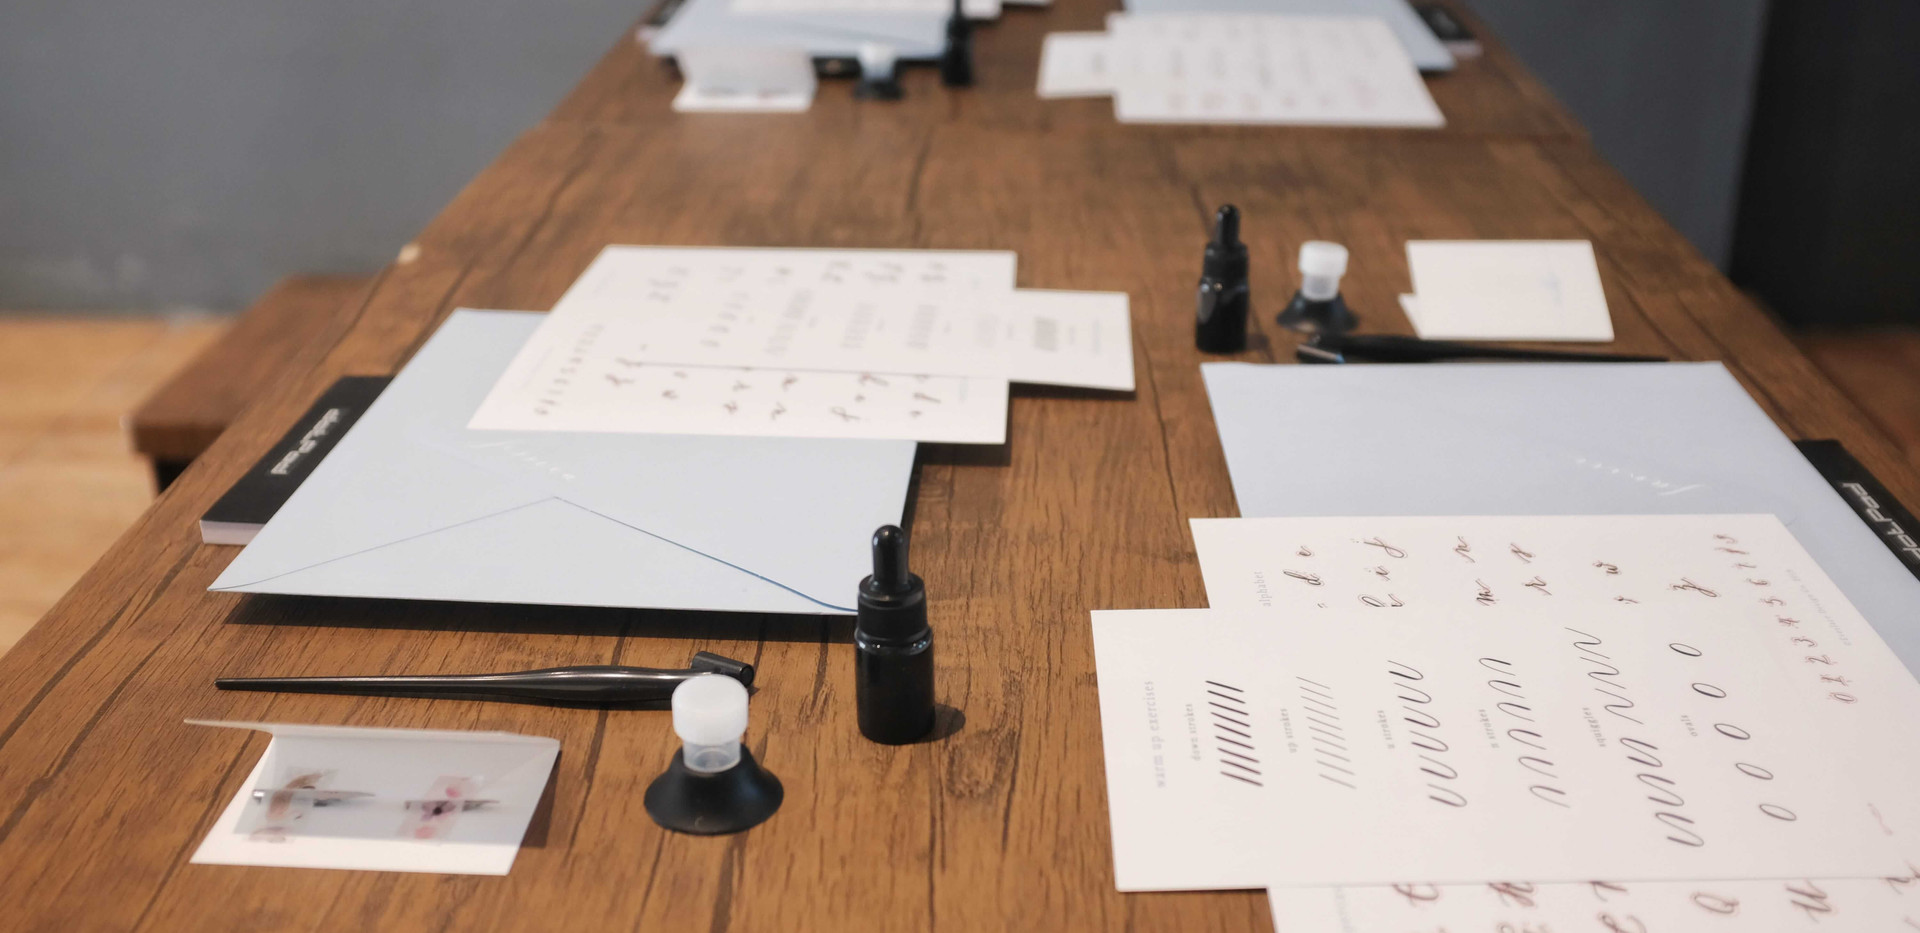 calligraphy-workshop-everlacedesignco-in